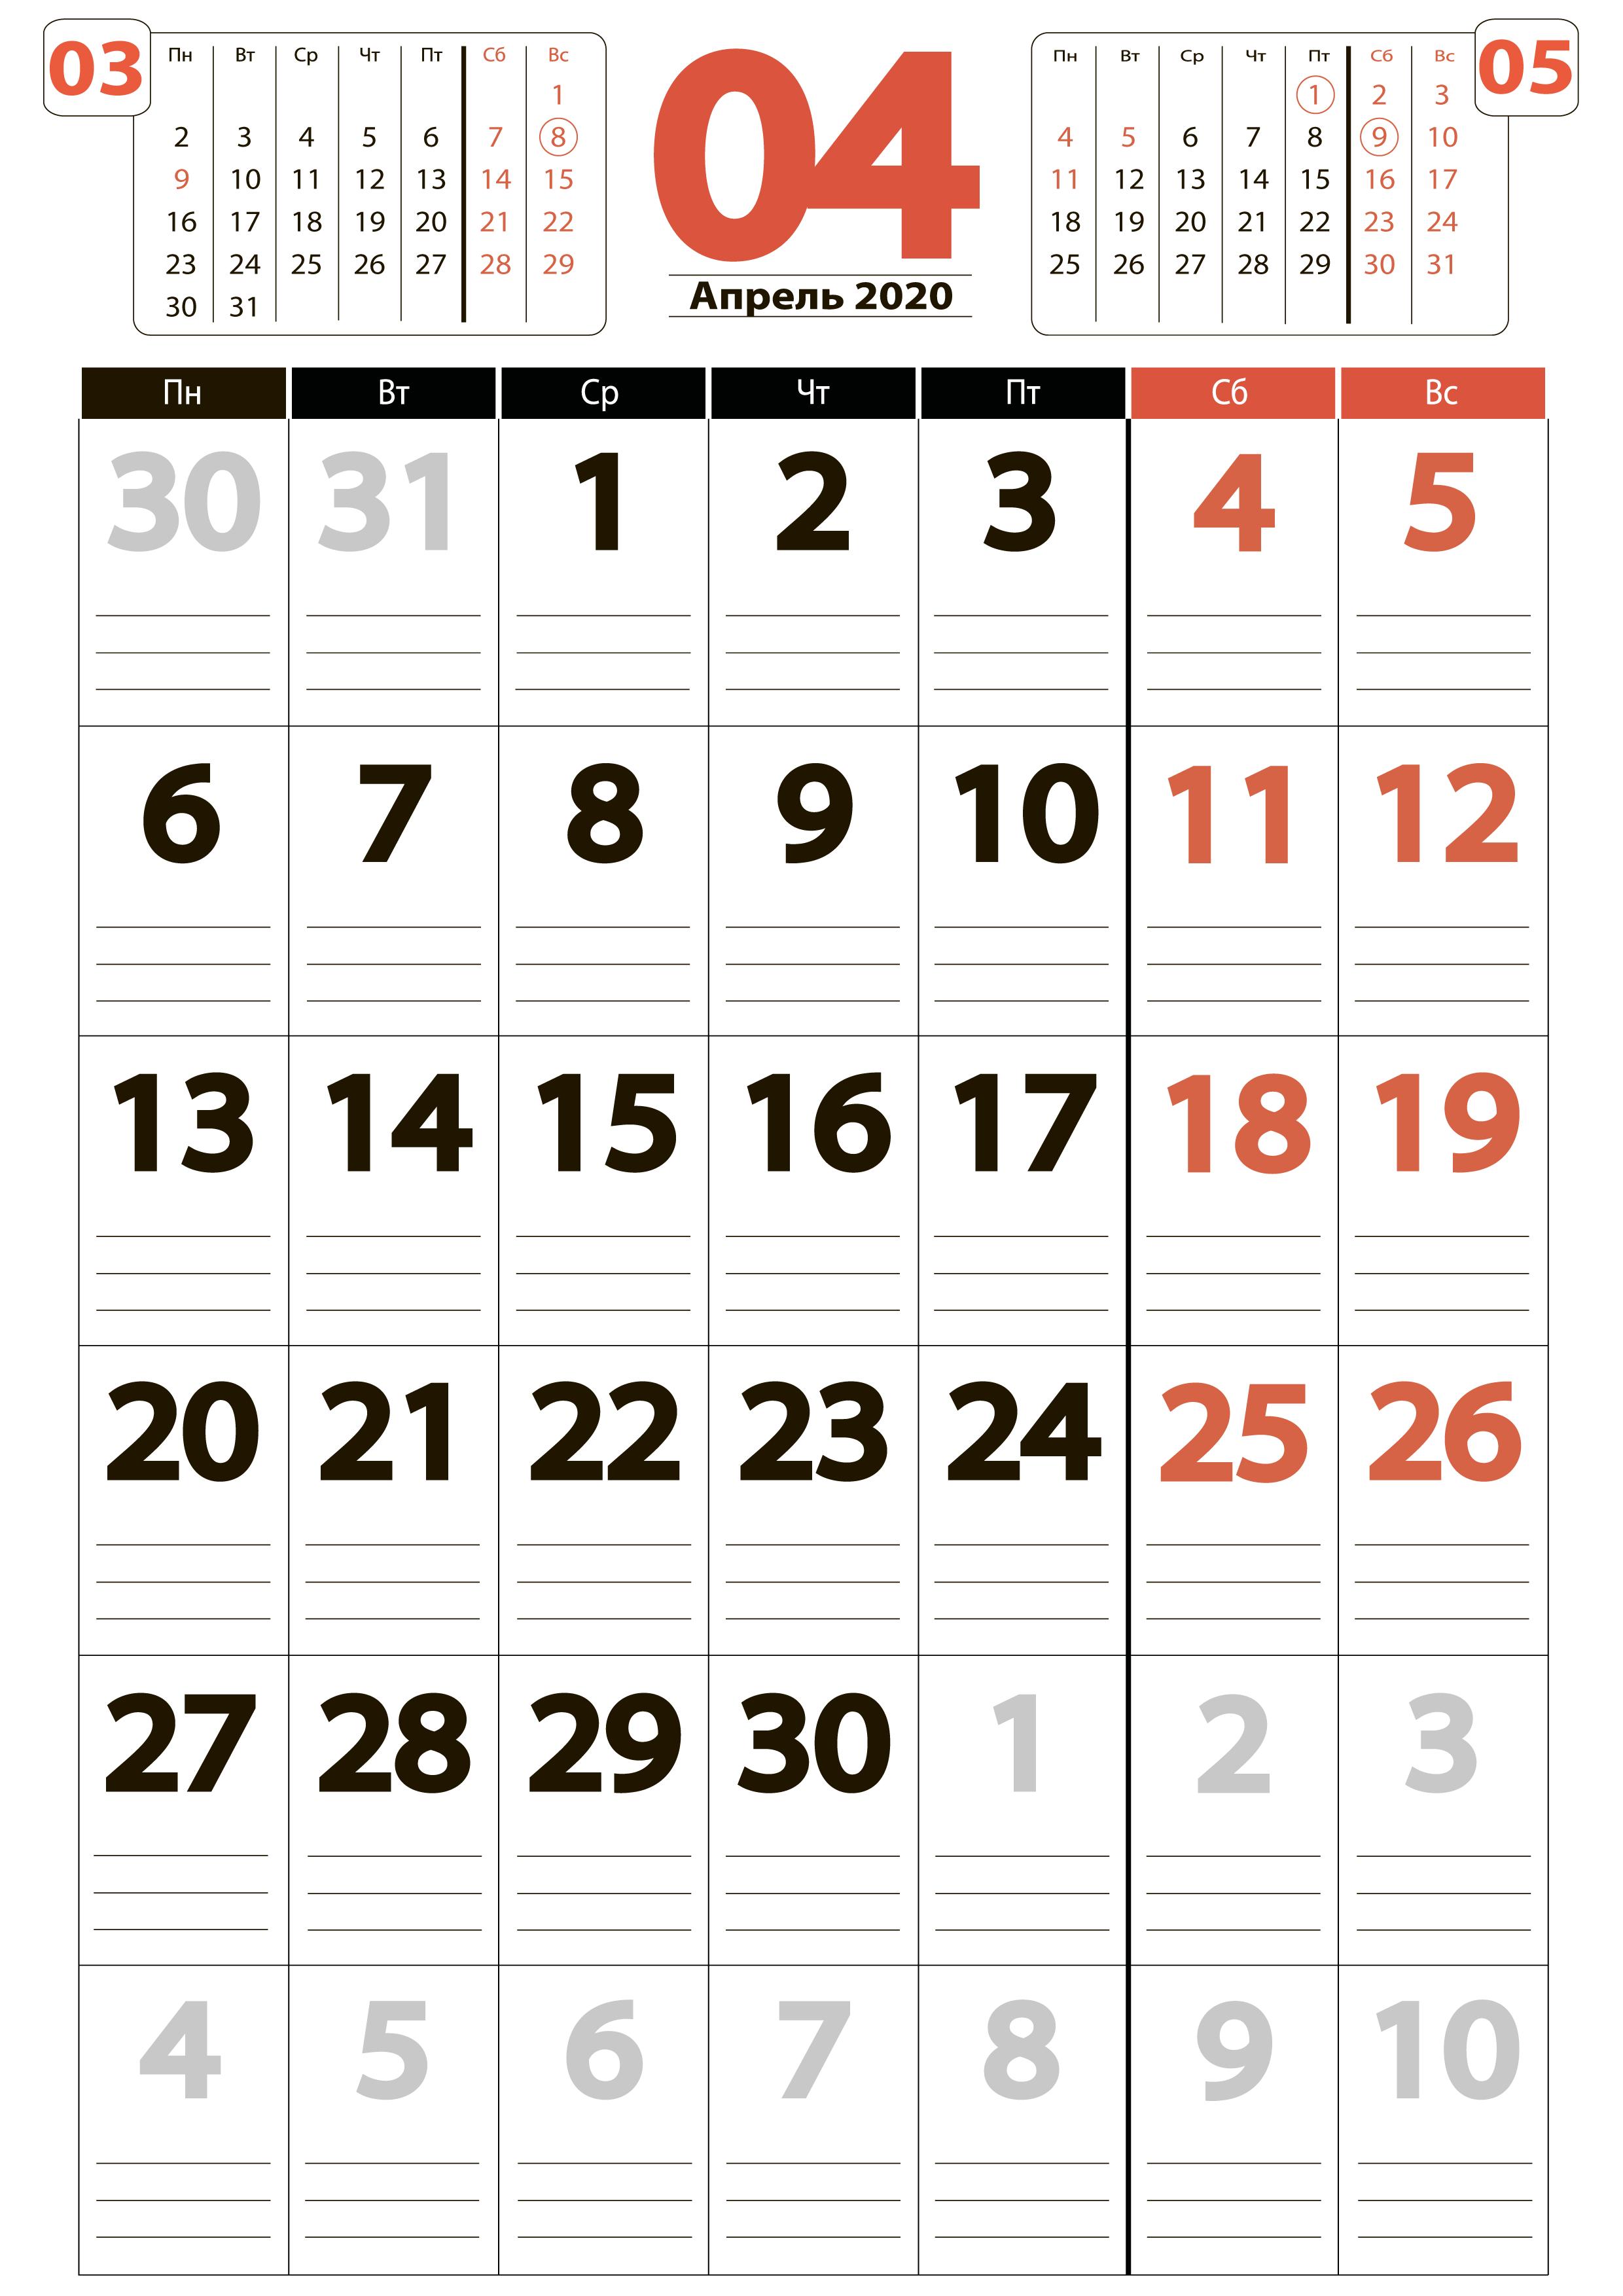 Апрель 2020 - Крупный календарь на месяц